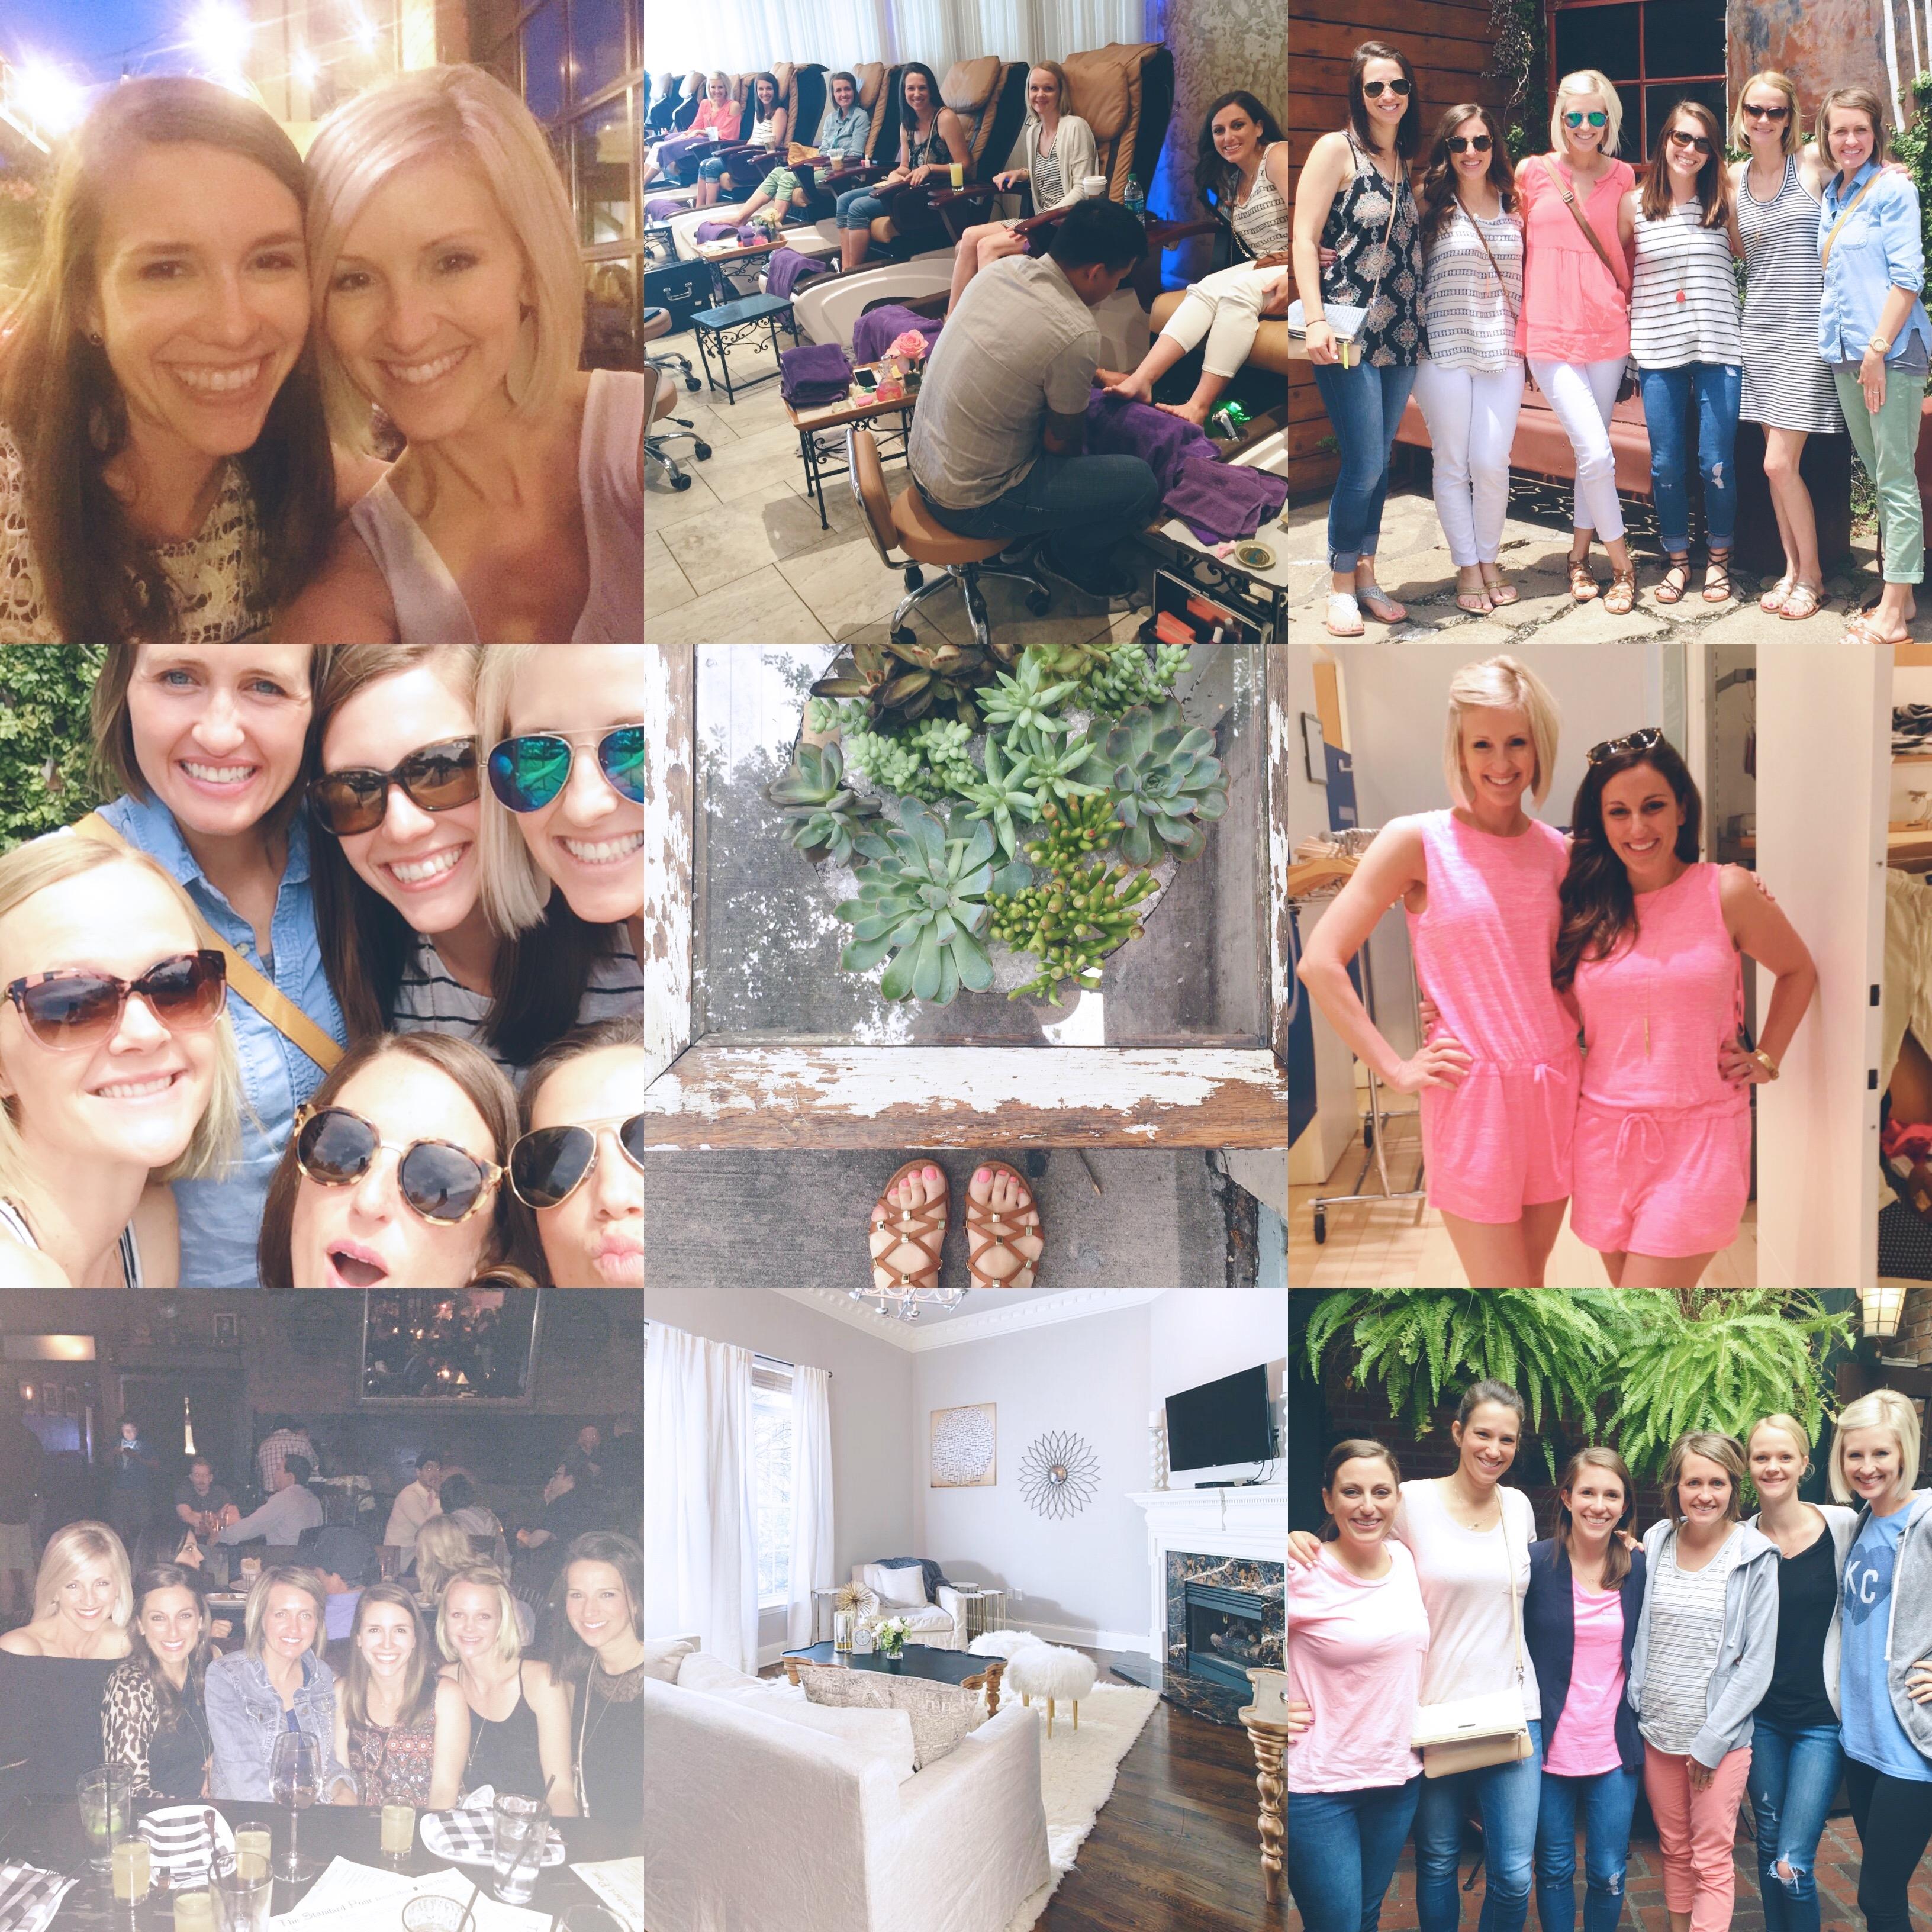 Dallas Girls Weekend